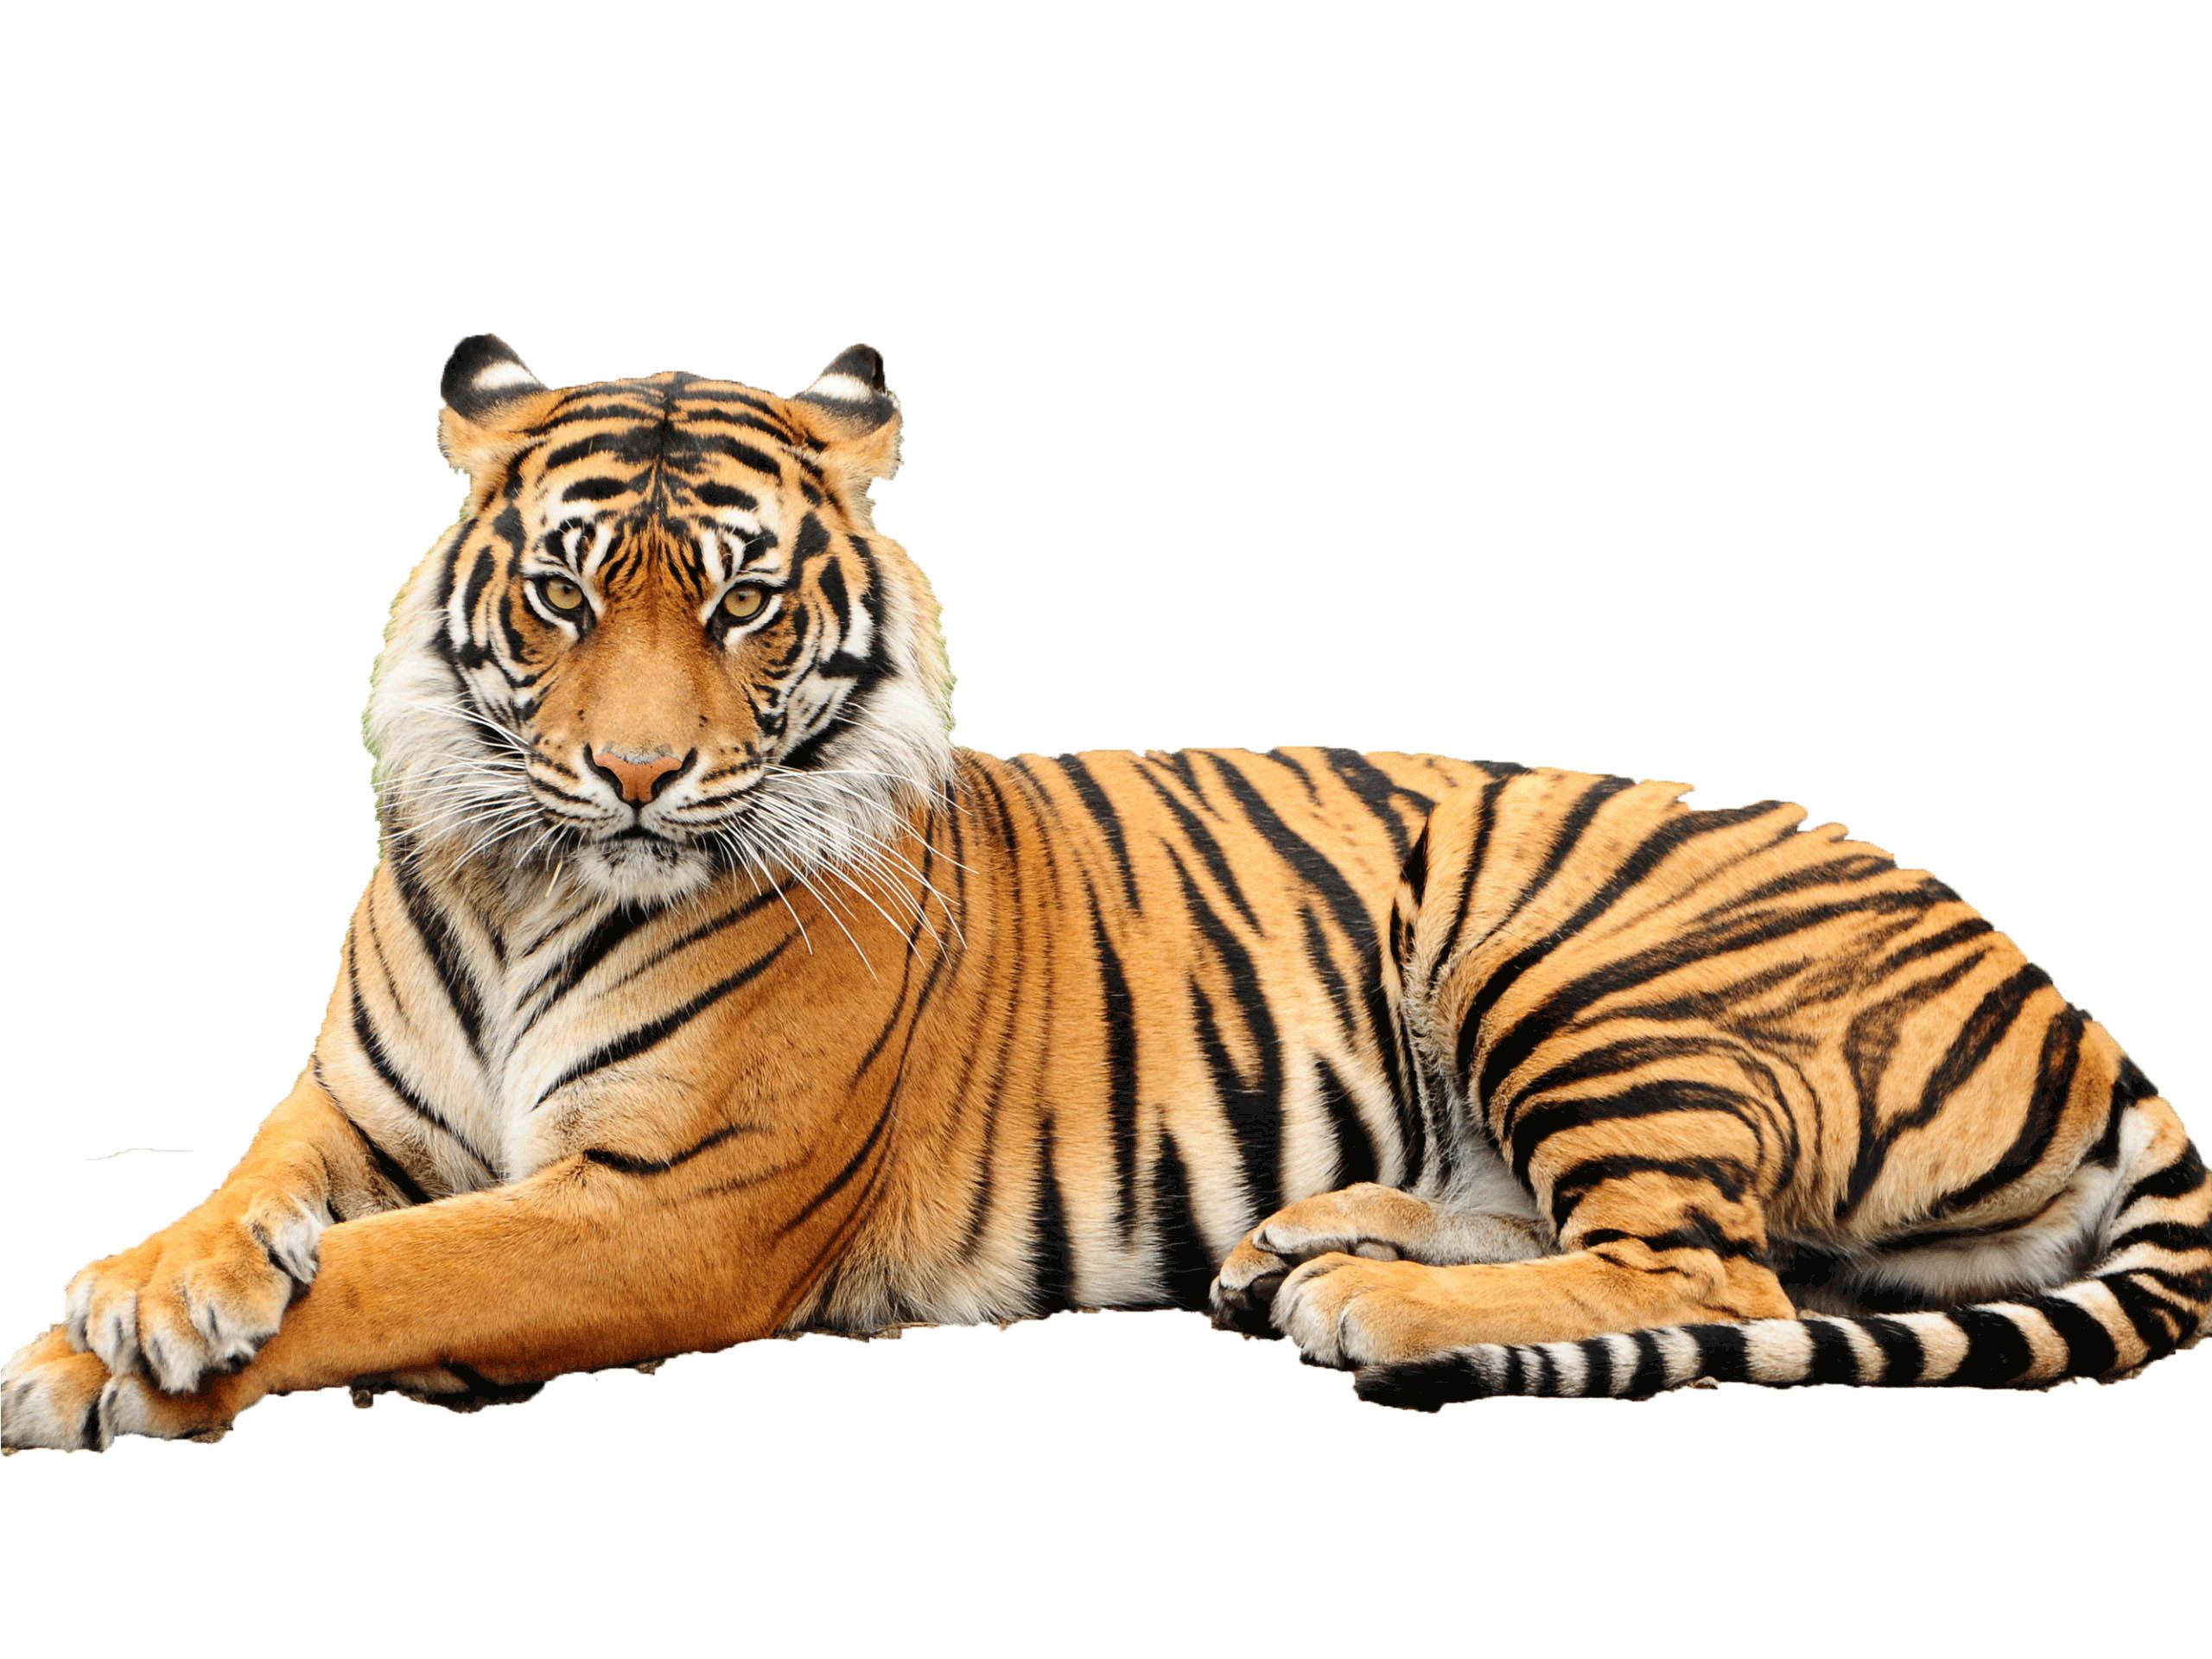 PNG Tiger Face - 58687